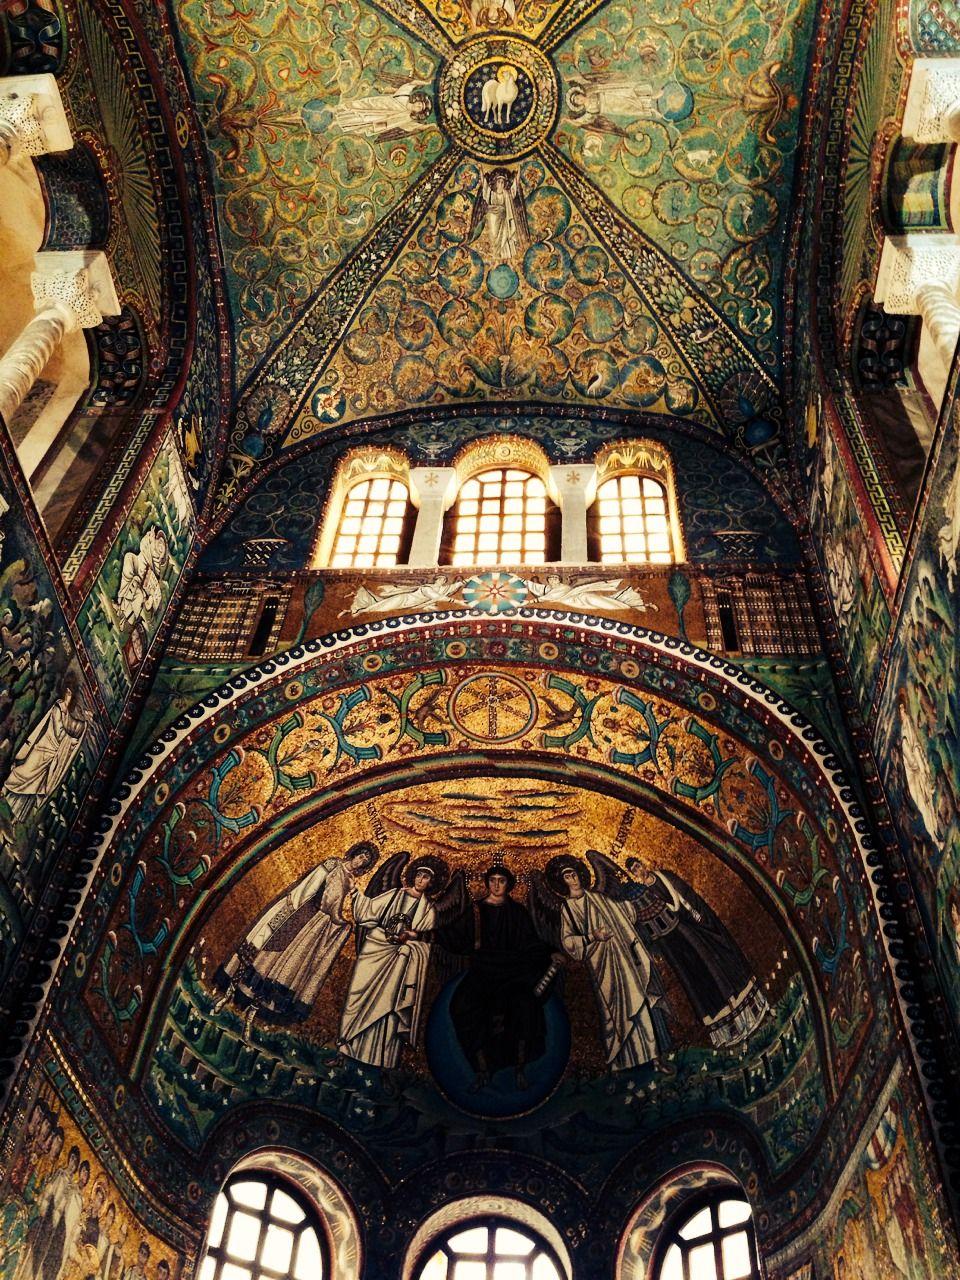 1,500 year old Byzantine mosaics in Ravenna.